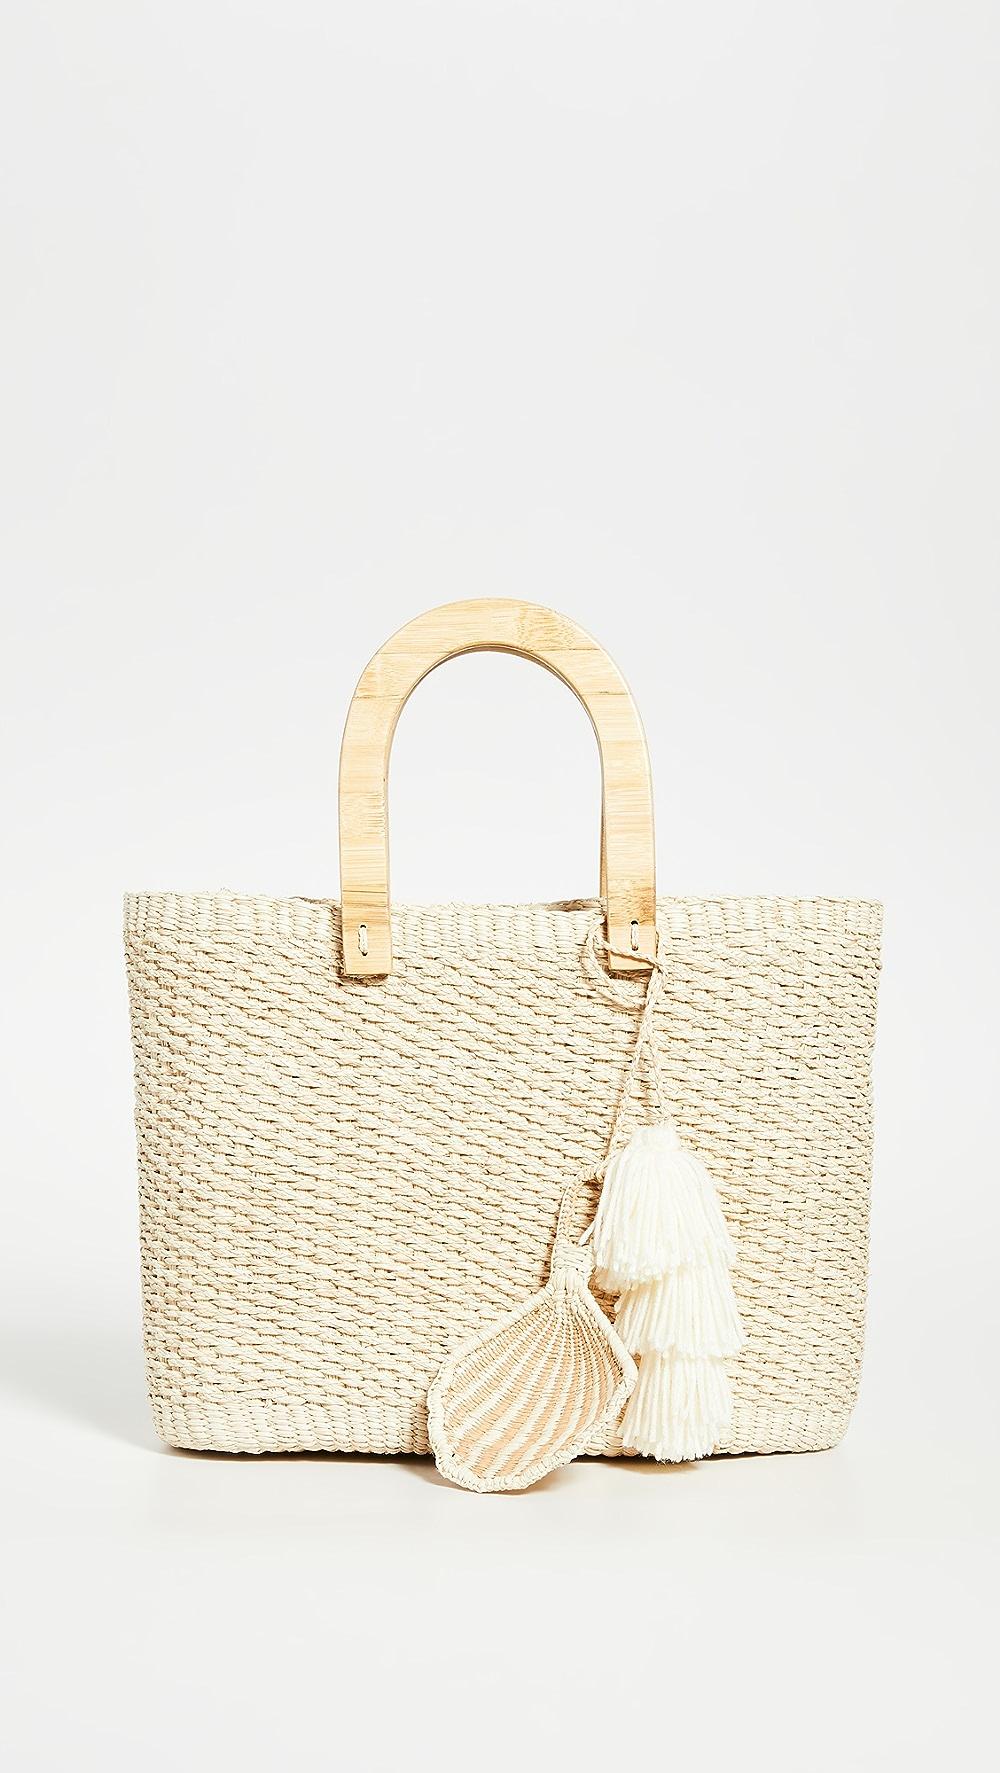 Fashion Style Sensi Studio - Canasta Wooden Handle Bag Relieving Rheumatism